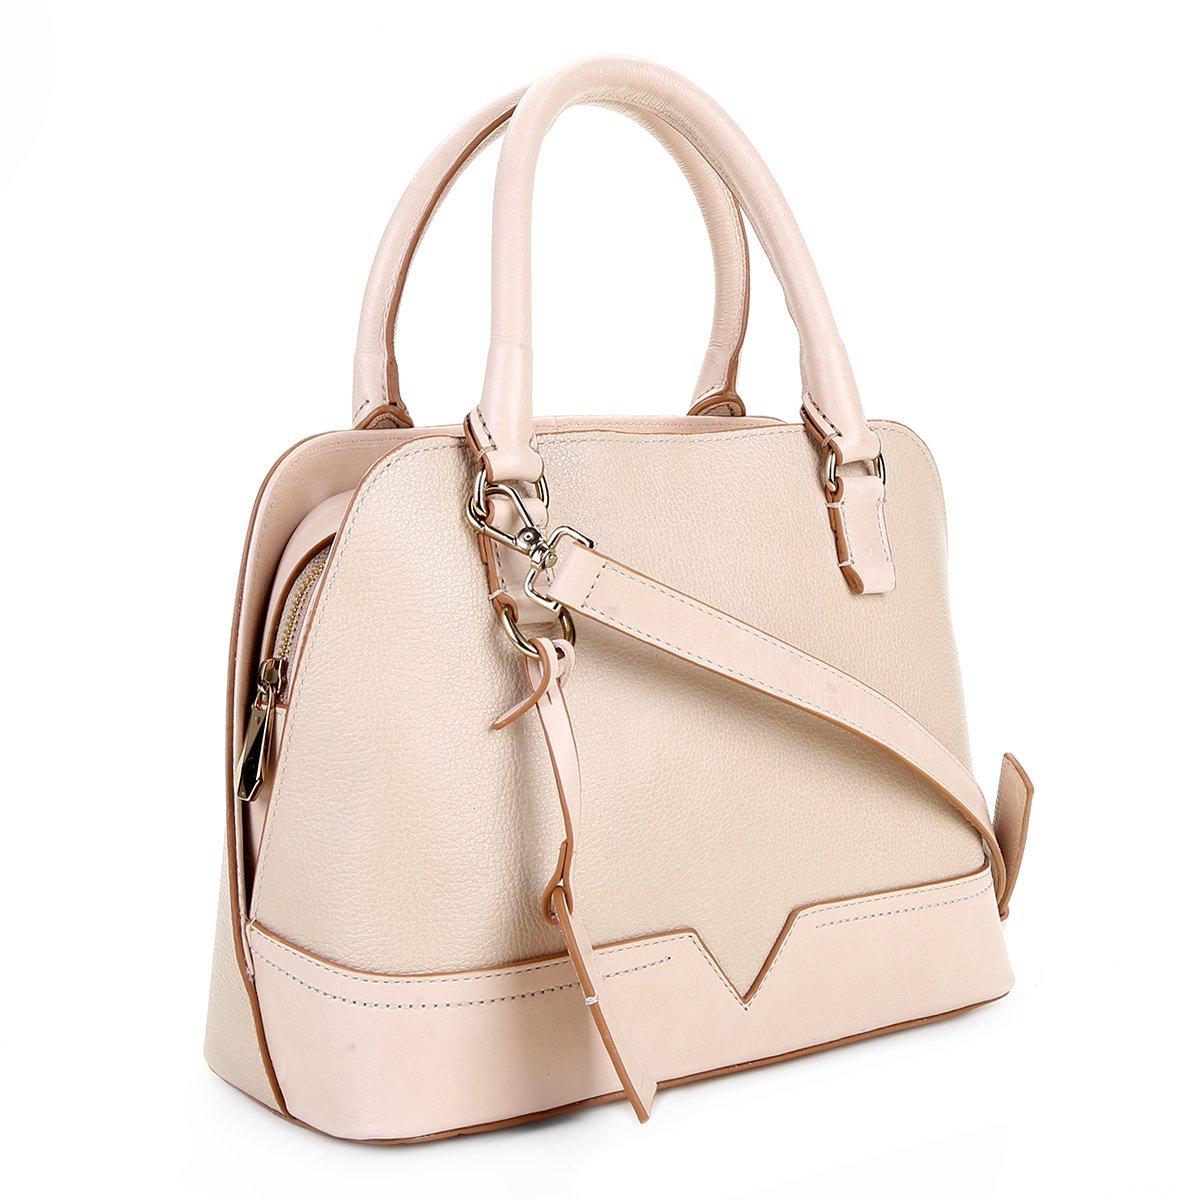 aabf4d6d1 Bolsa Couro Shoestock Handbag Clássica Feminina - Compre Agora | Zattini